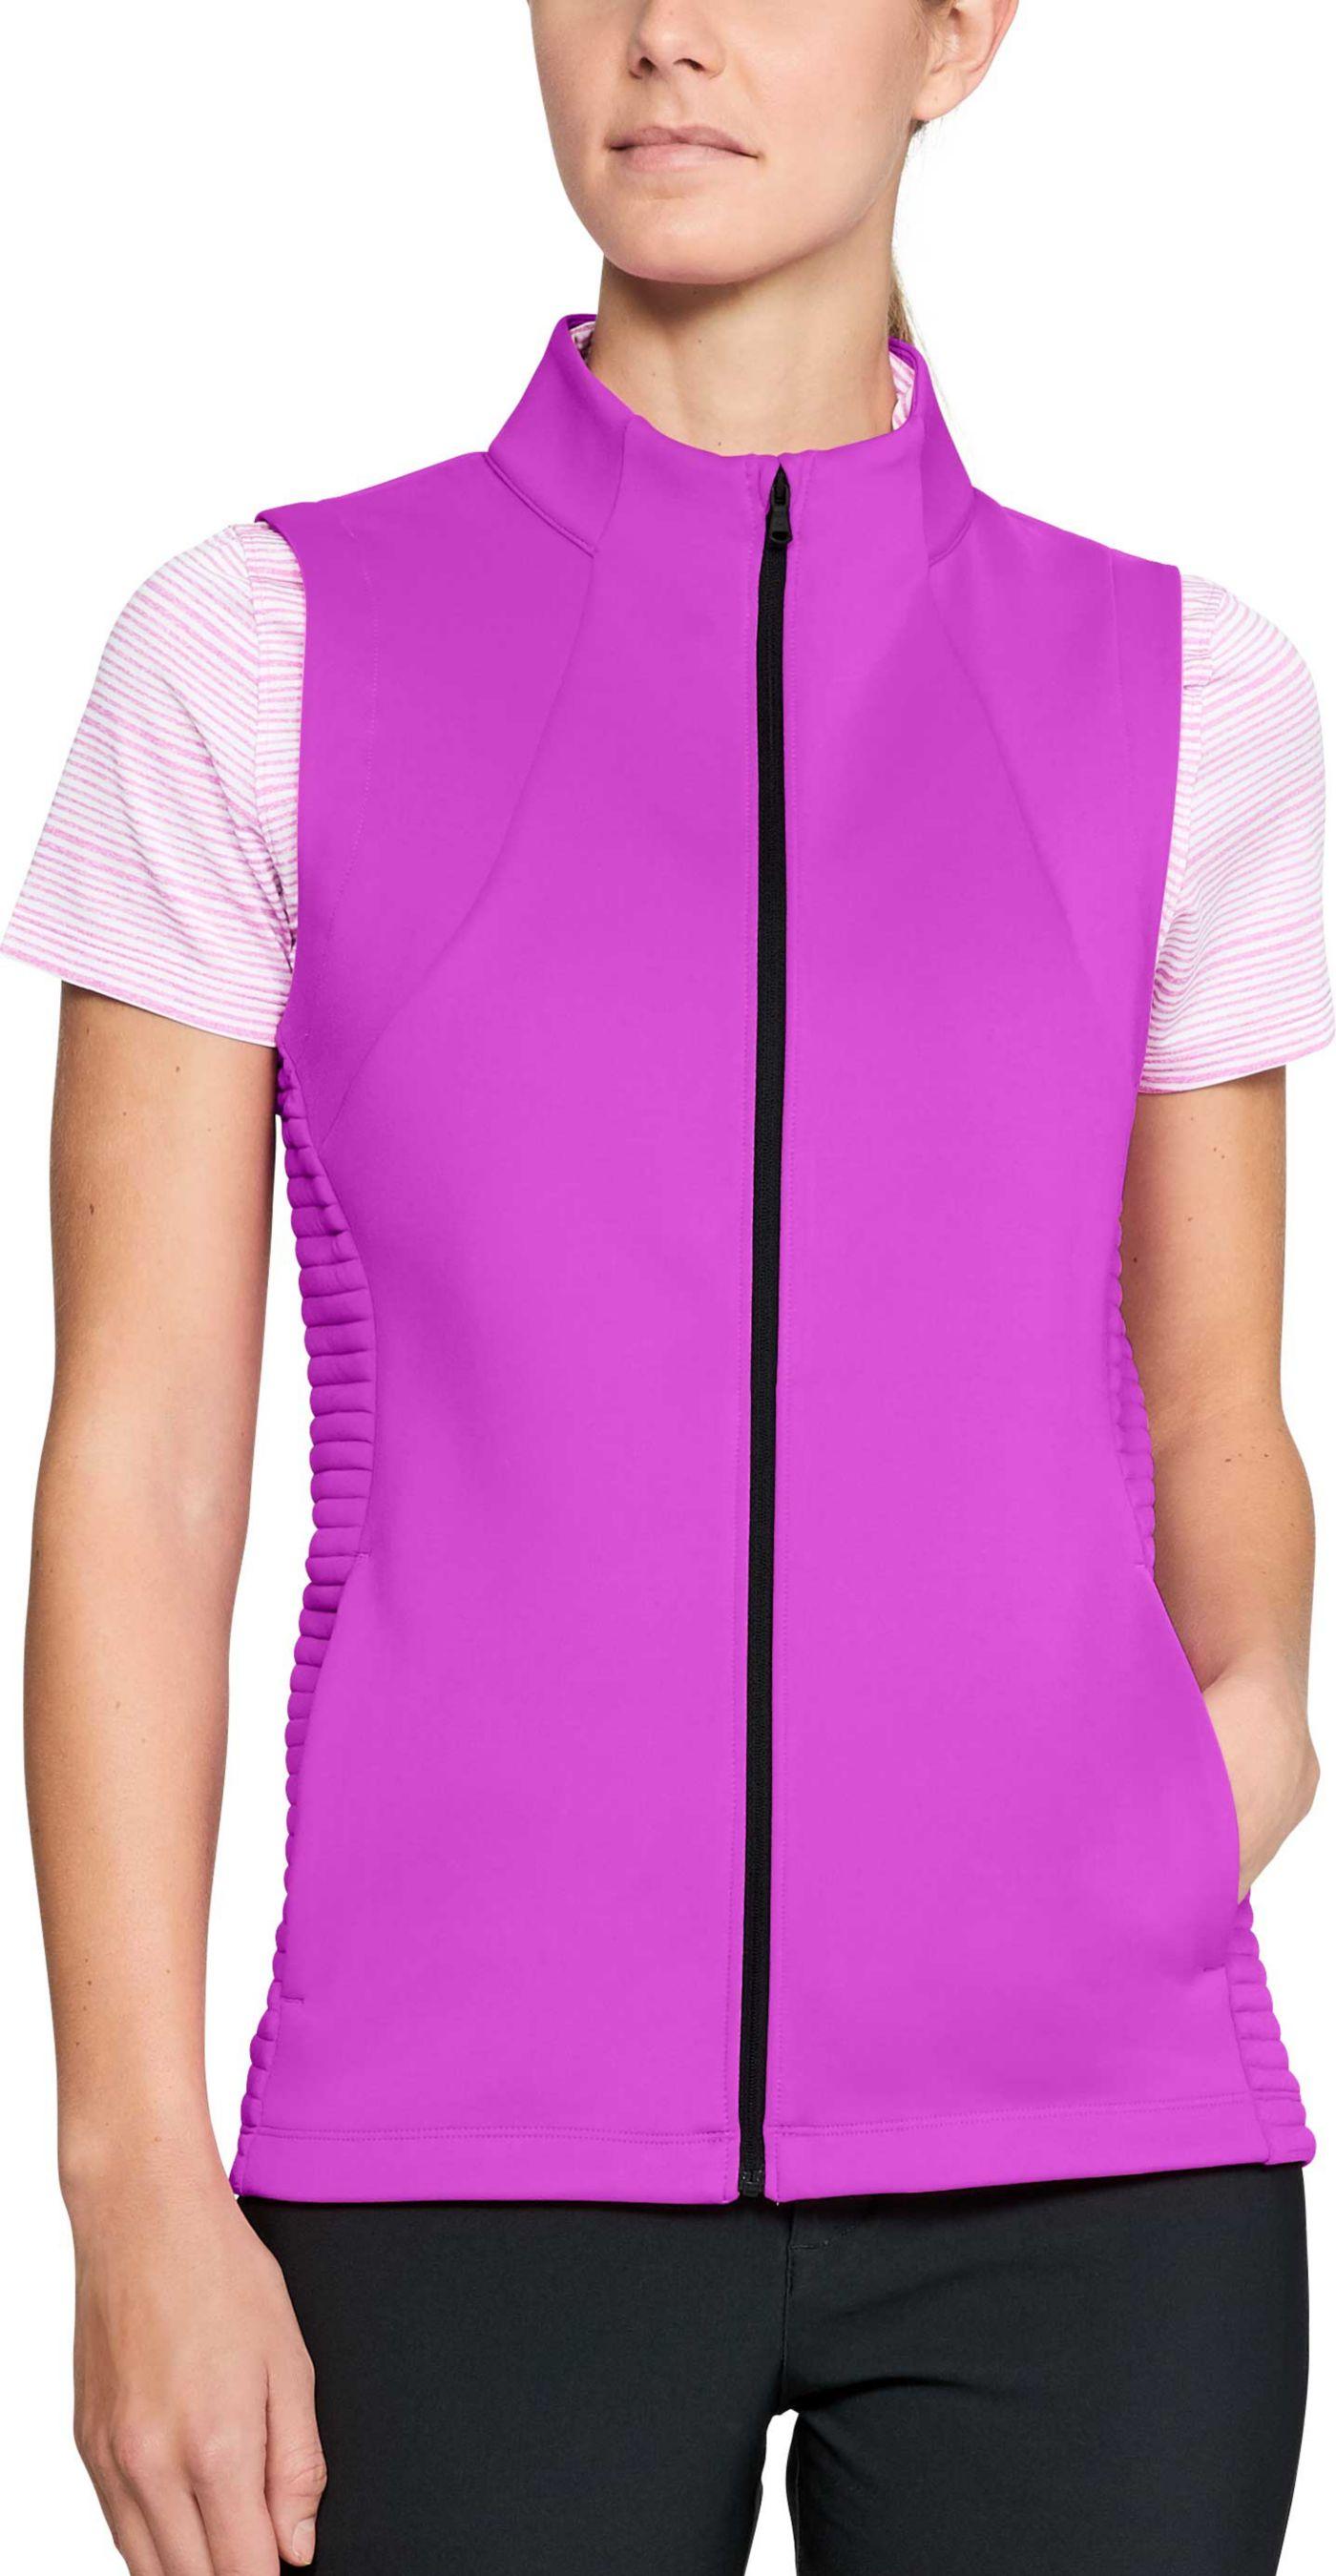 Under Armour Women's Storm Daytona Golf Vest